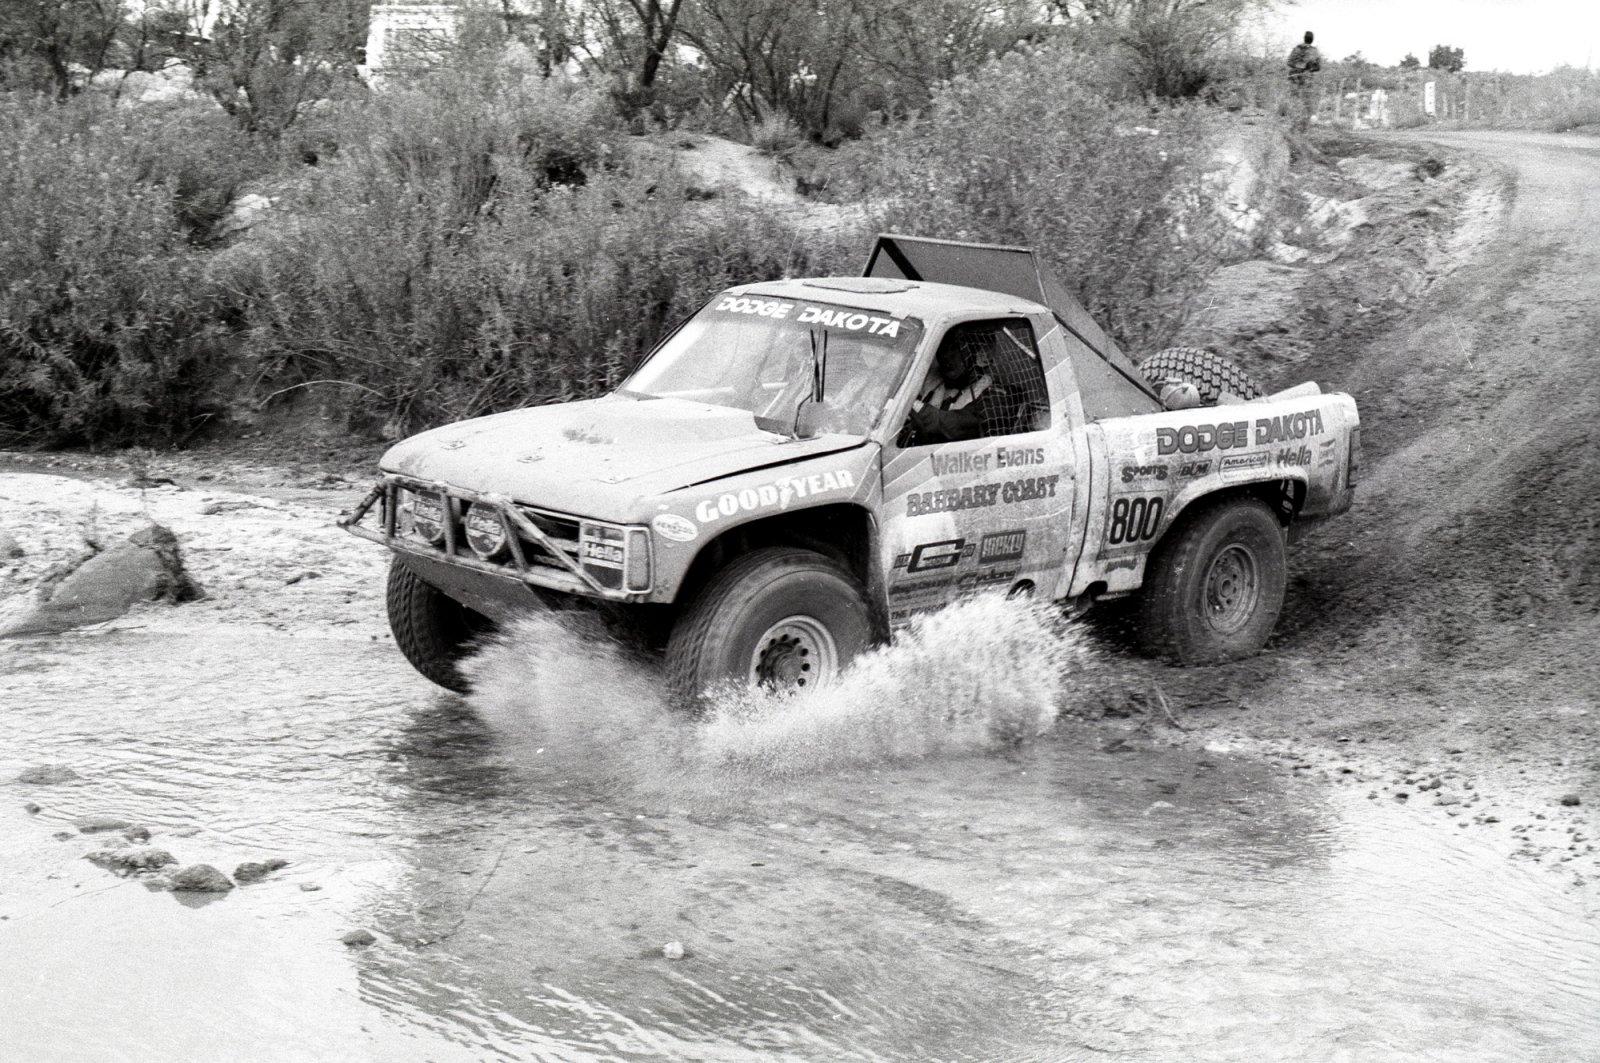 1987. Baja 1000. 800. Evans. Dakota. WER.21x.jpg